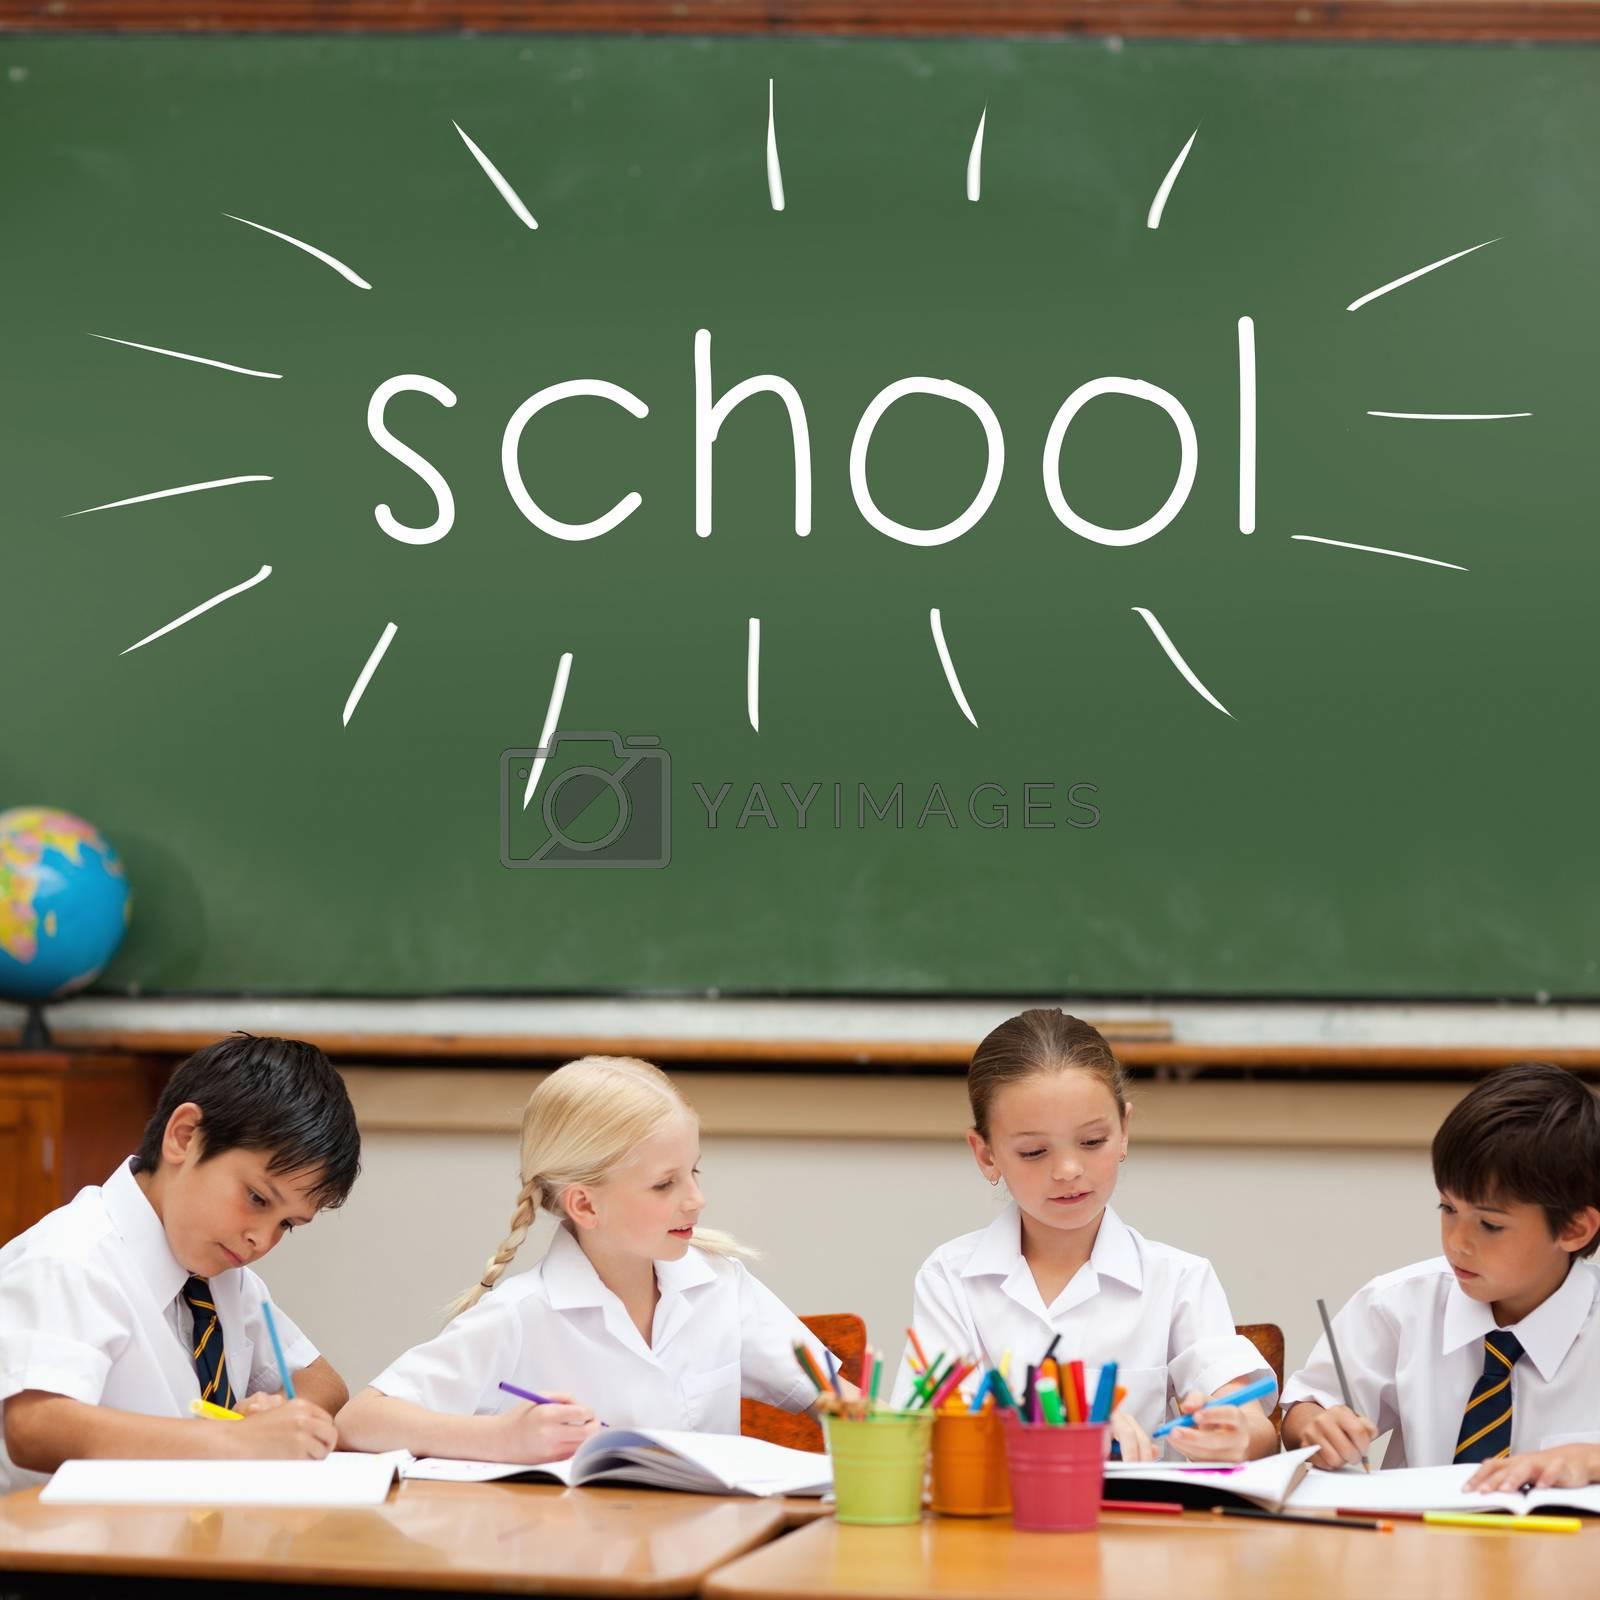 School against cute pupils sitting at desk by Wavebreakmedia